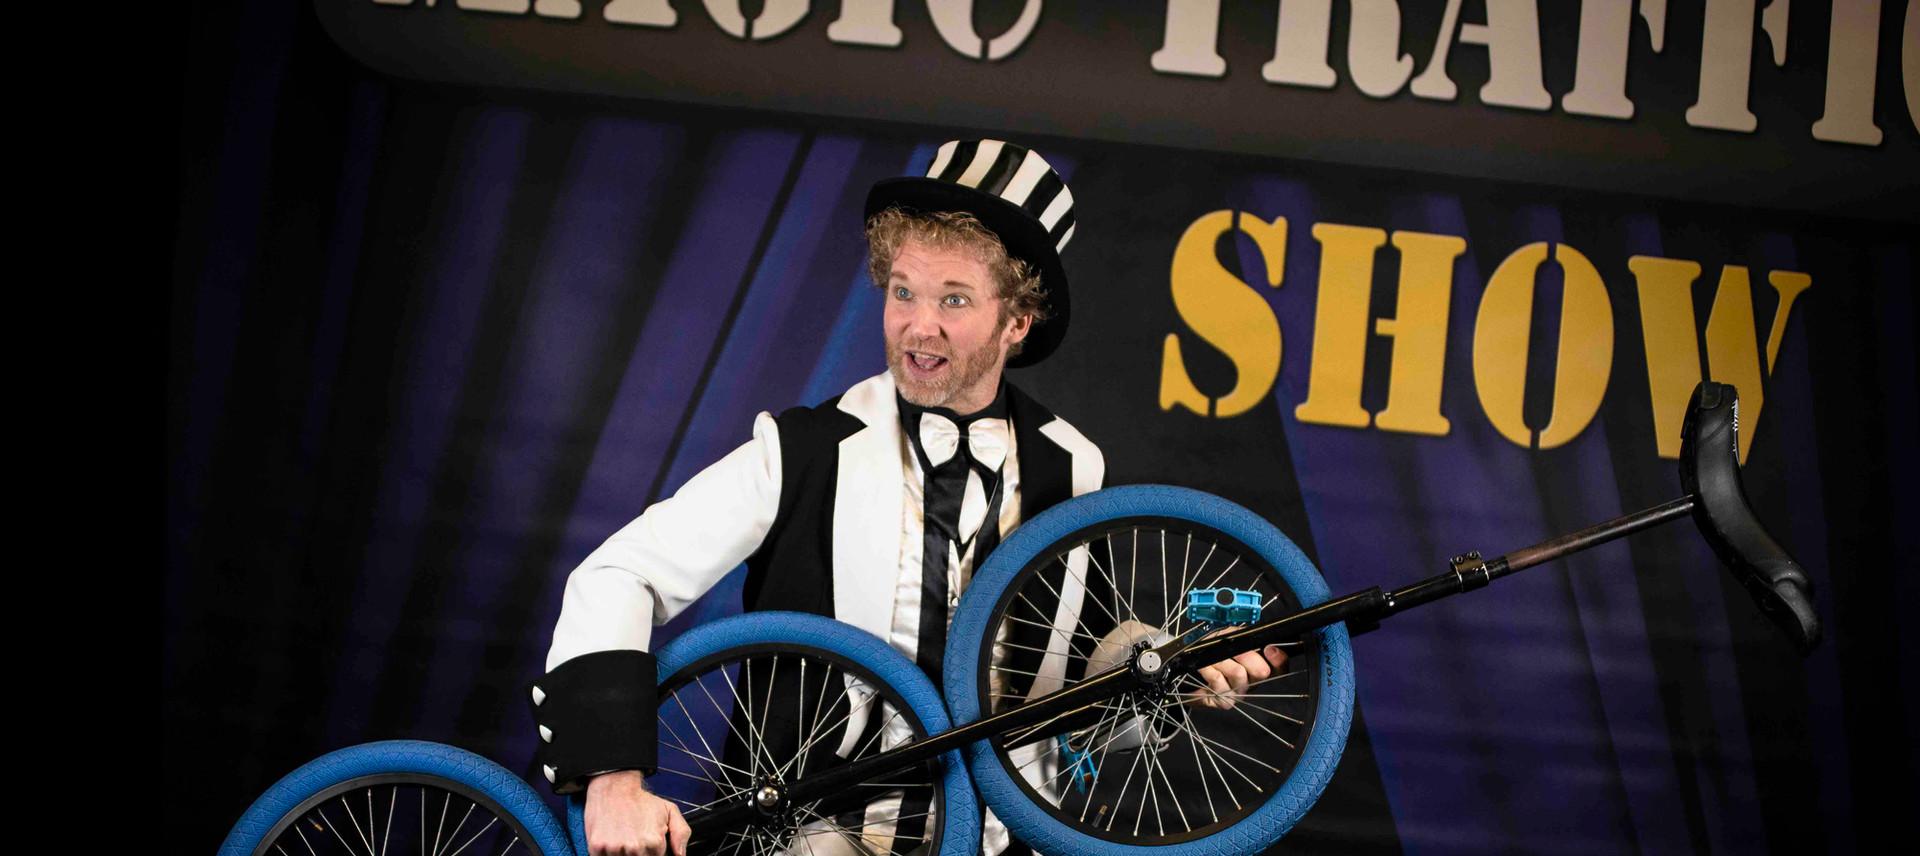 Voorstelling verkeer goochelaar circus s